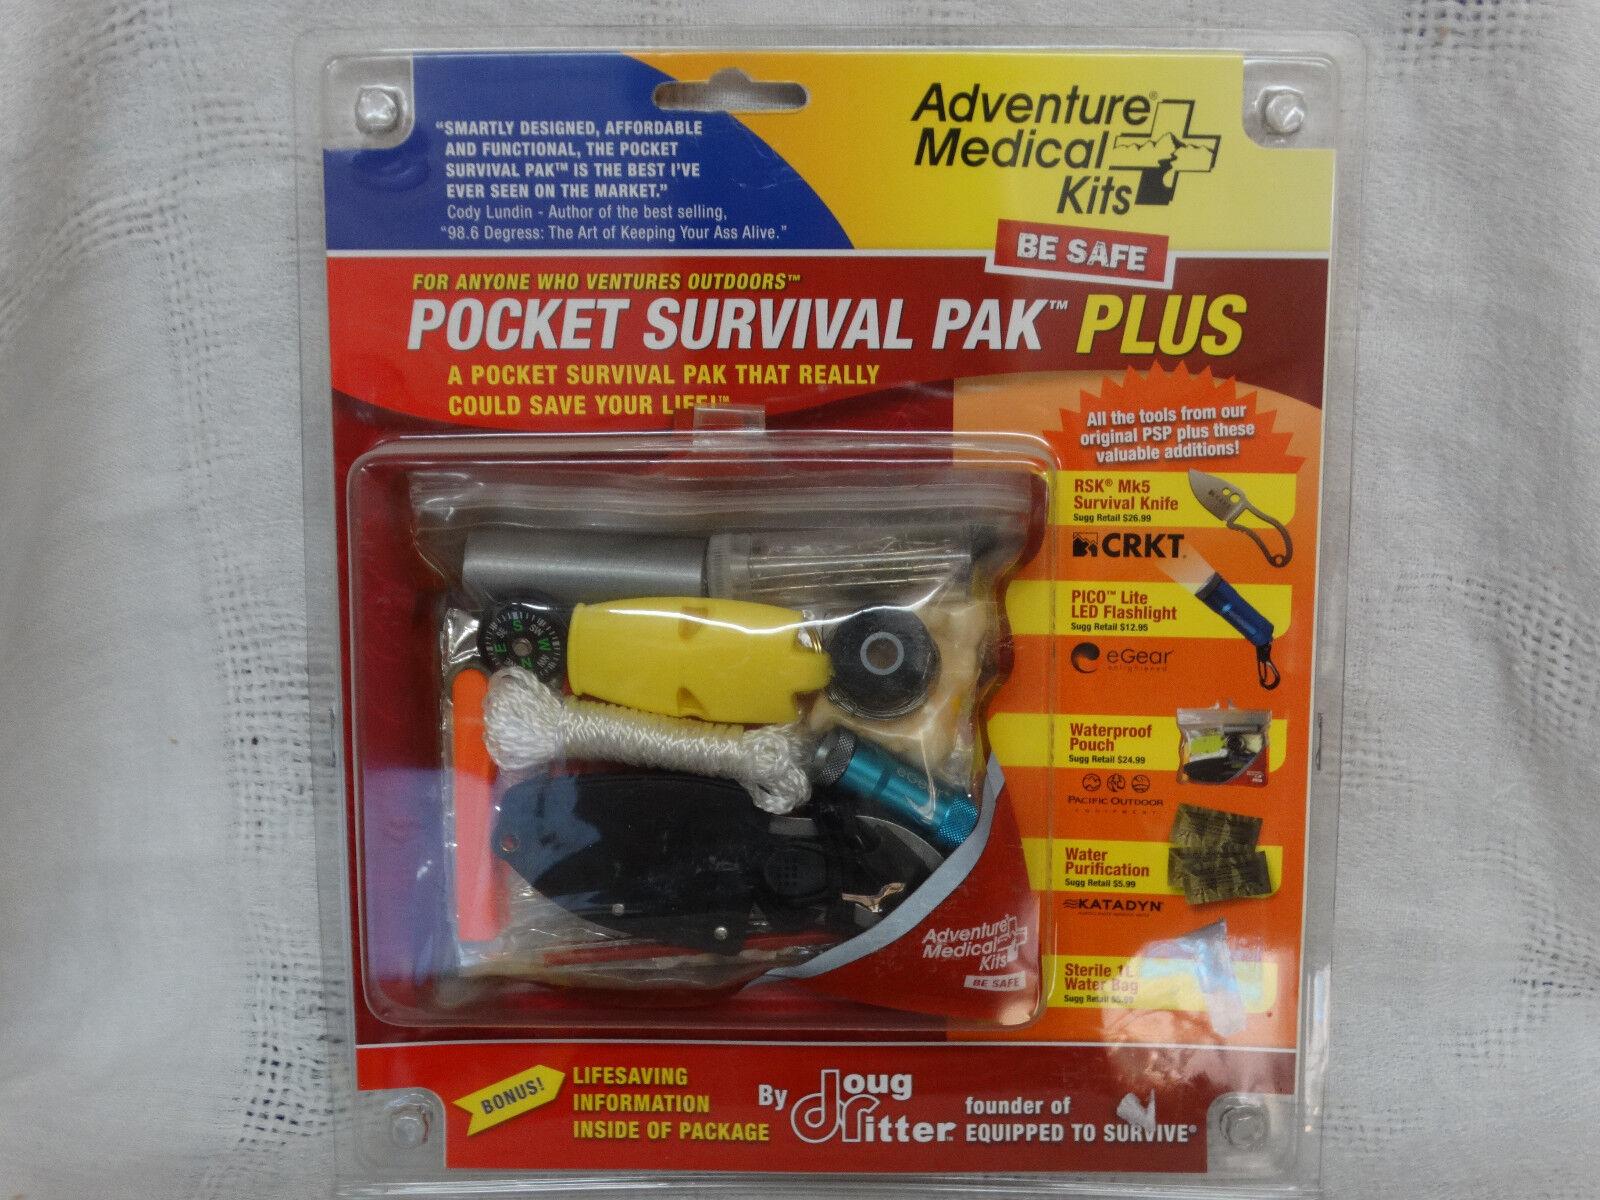 Adventure medical kits de súpervivencia de bolsillo PAK PLUS